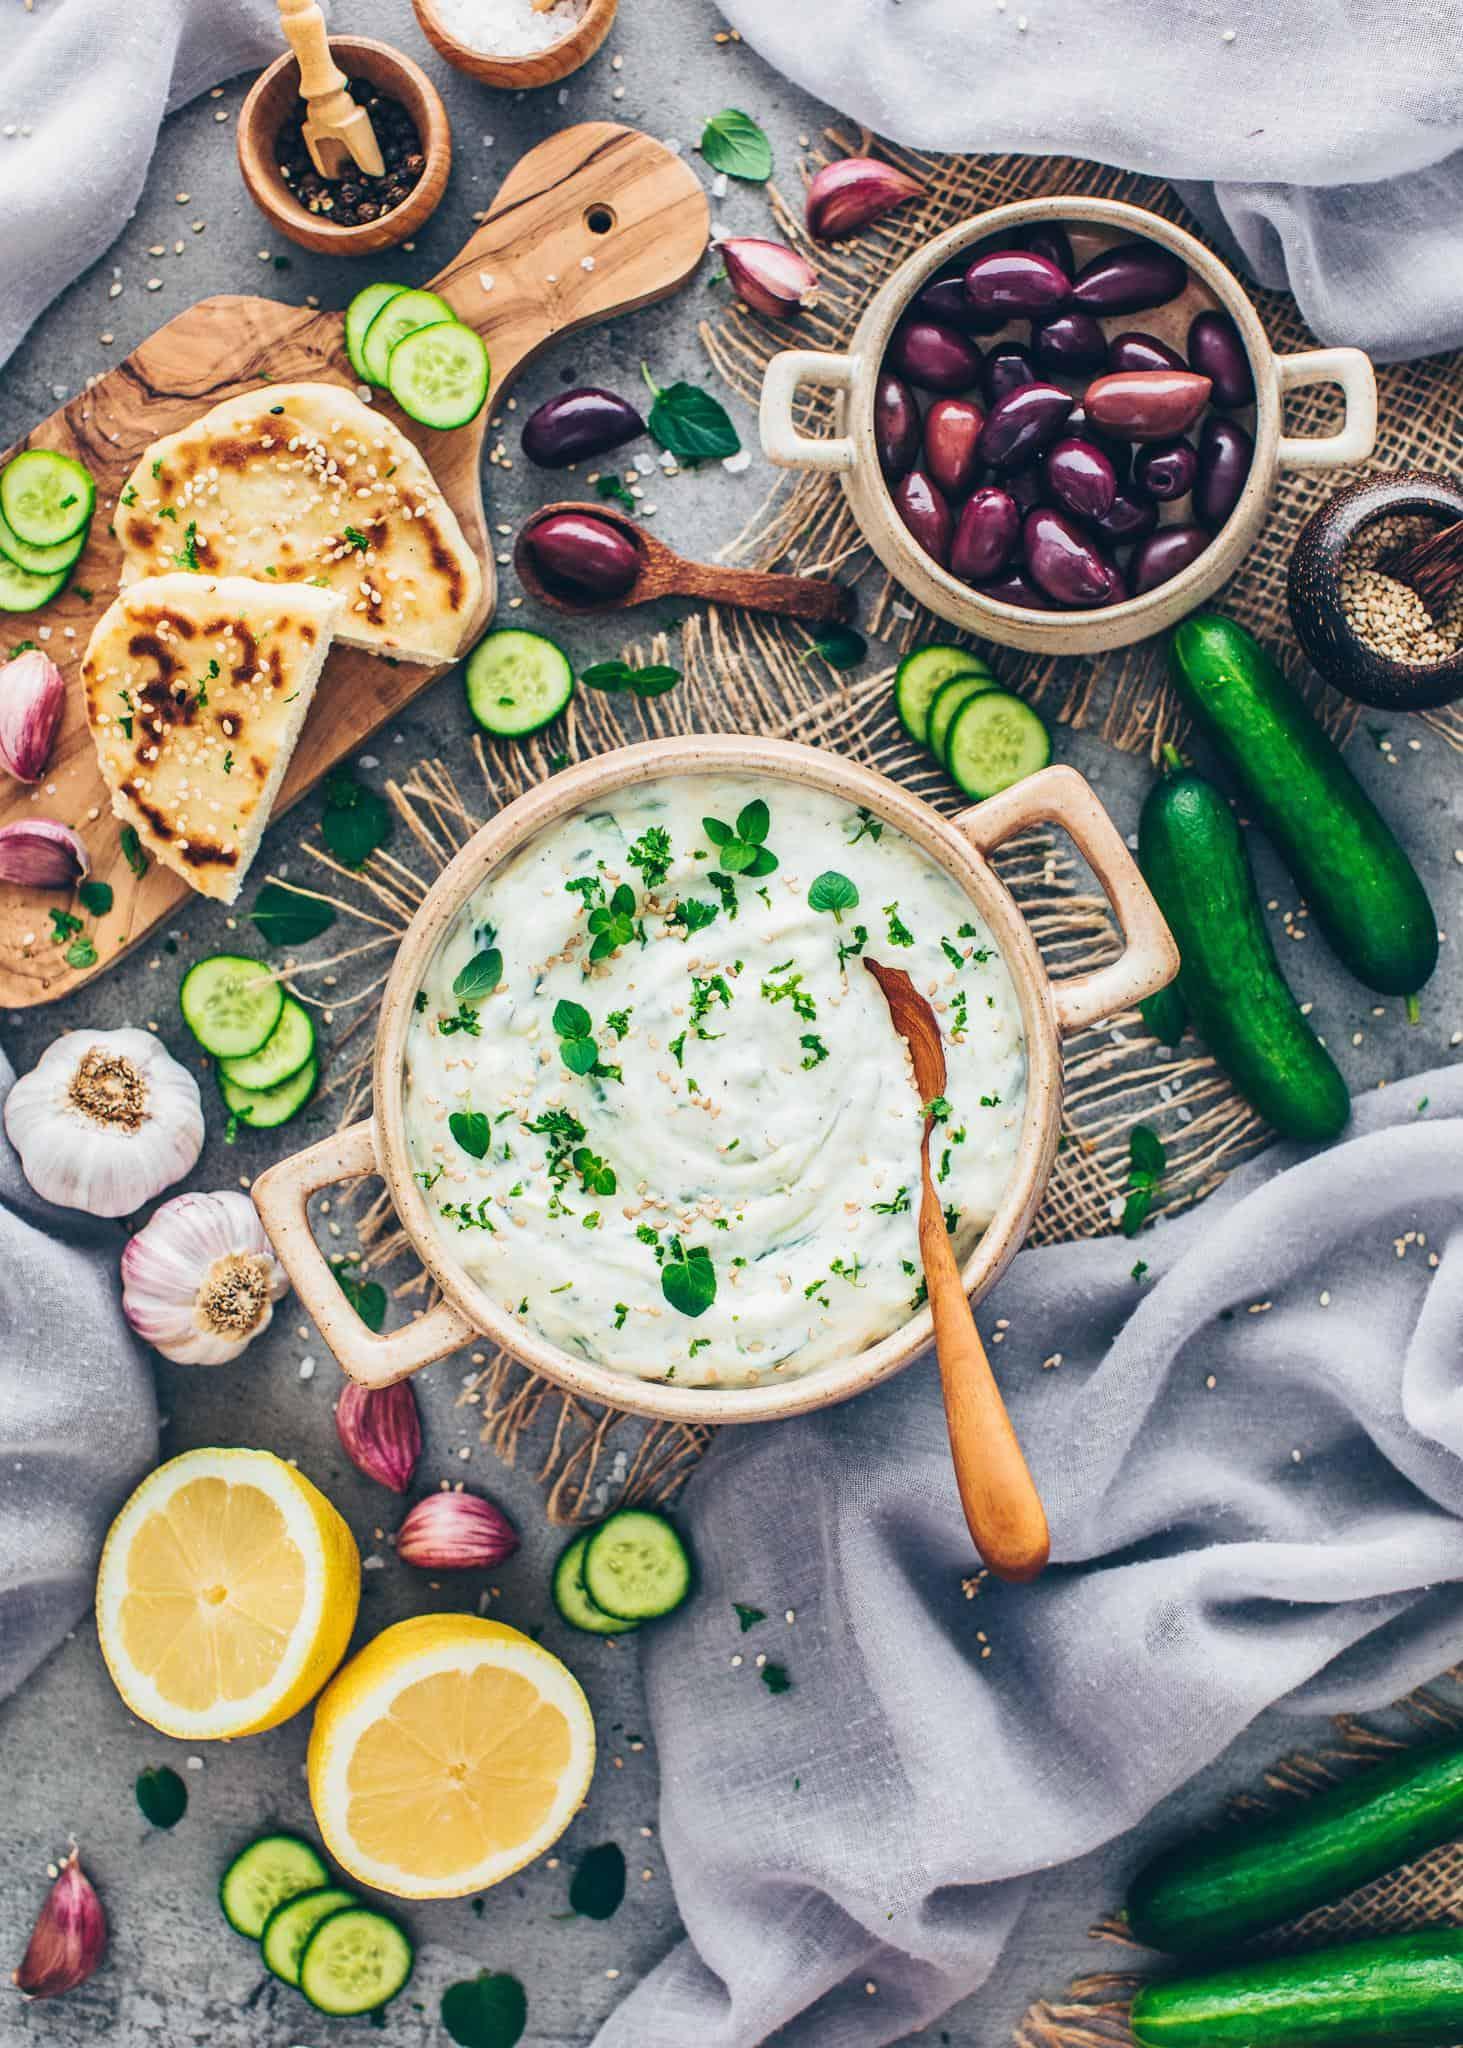 Tzatziki with cucumber, garlic, lemon juice, olive oil, olives, flatbread